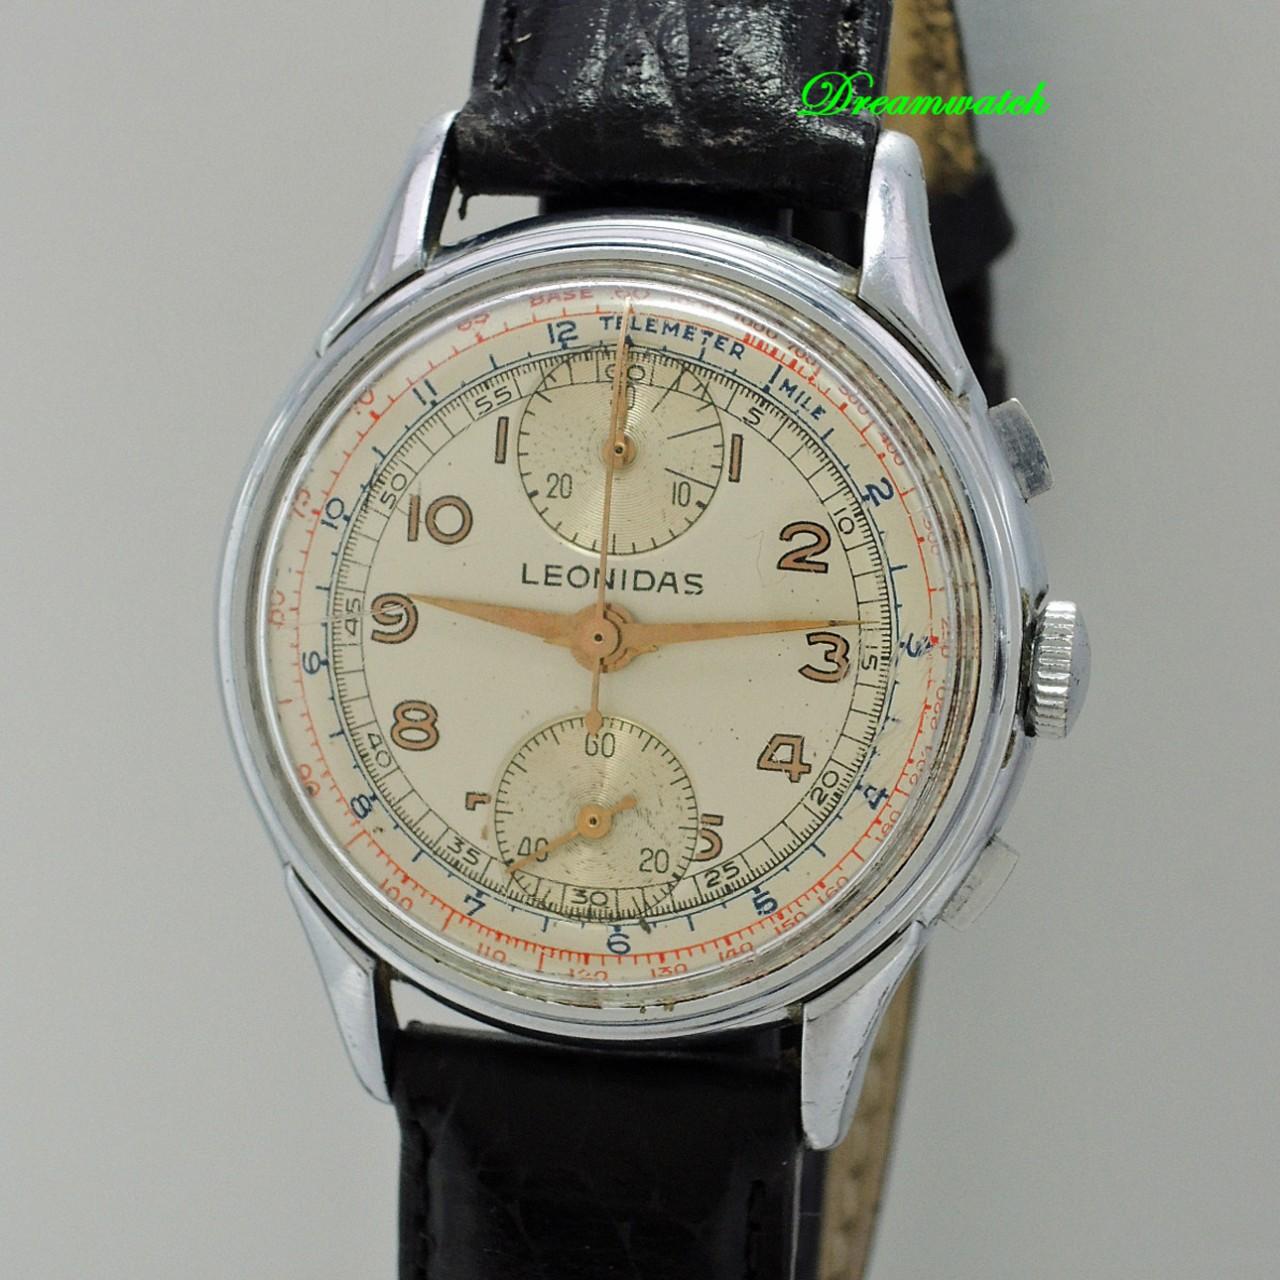 Leonidas Vintage Chronograph Valjoux 77